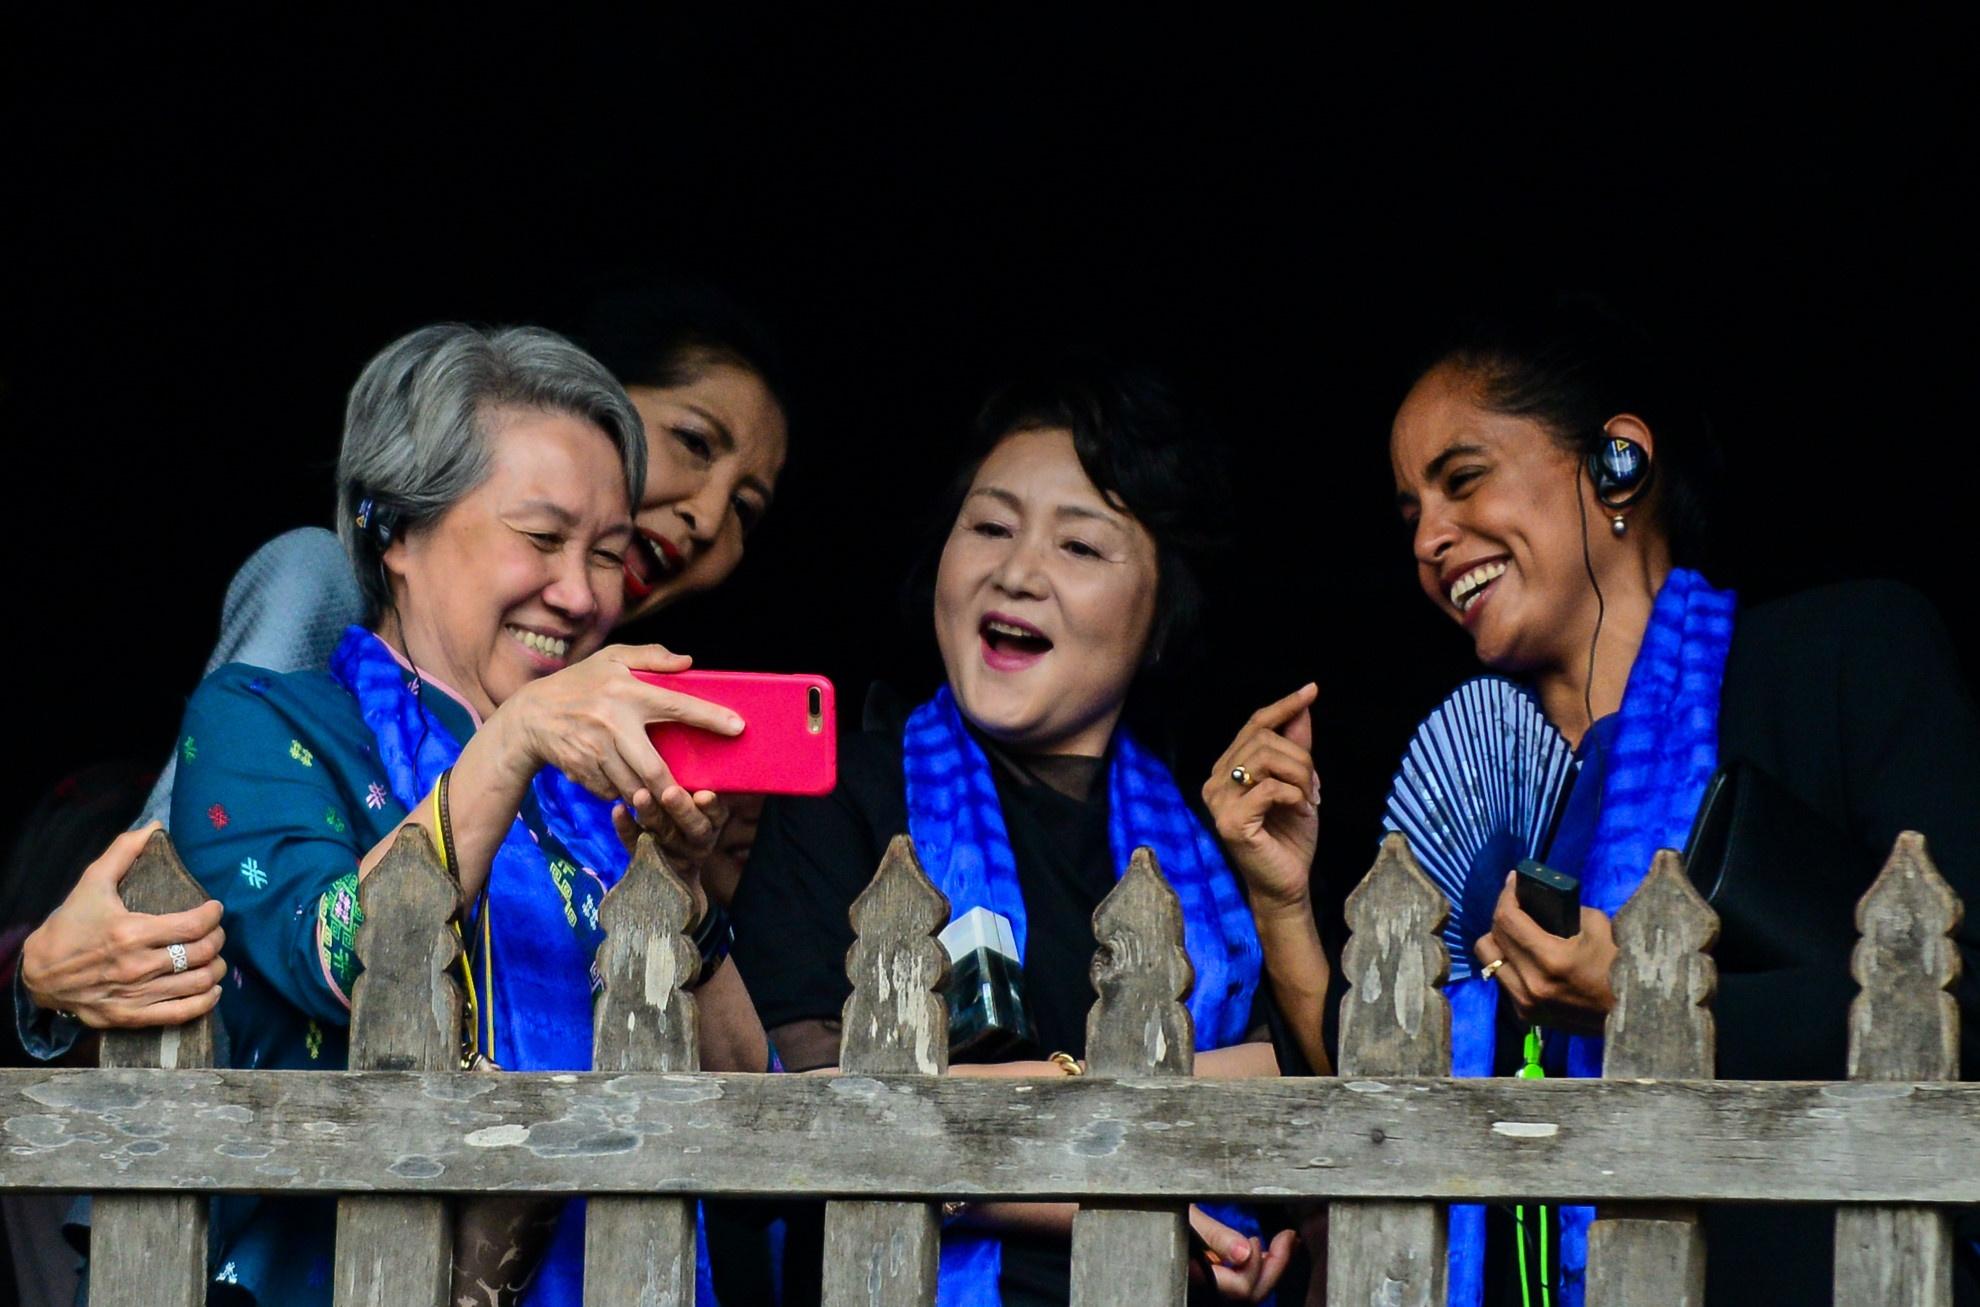 Nhat ky APEC 11/11: Ong Trump khong di 'The Beast' khi roi Da Nang hinh anh 4